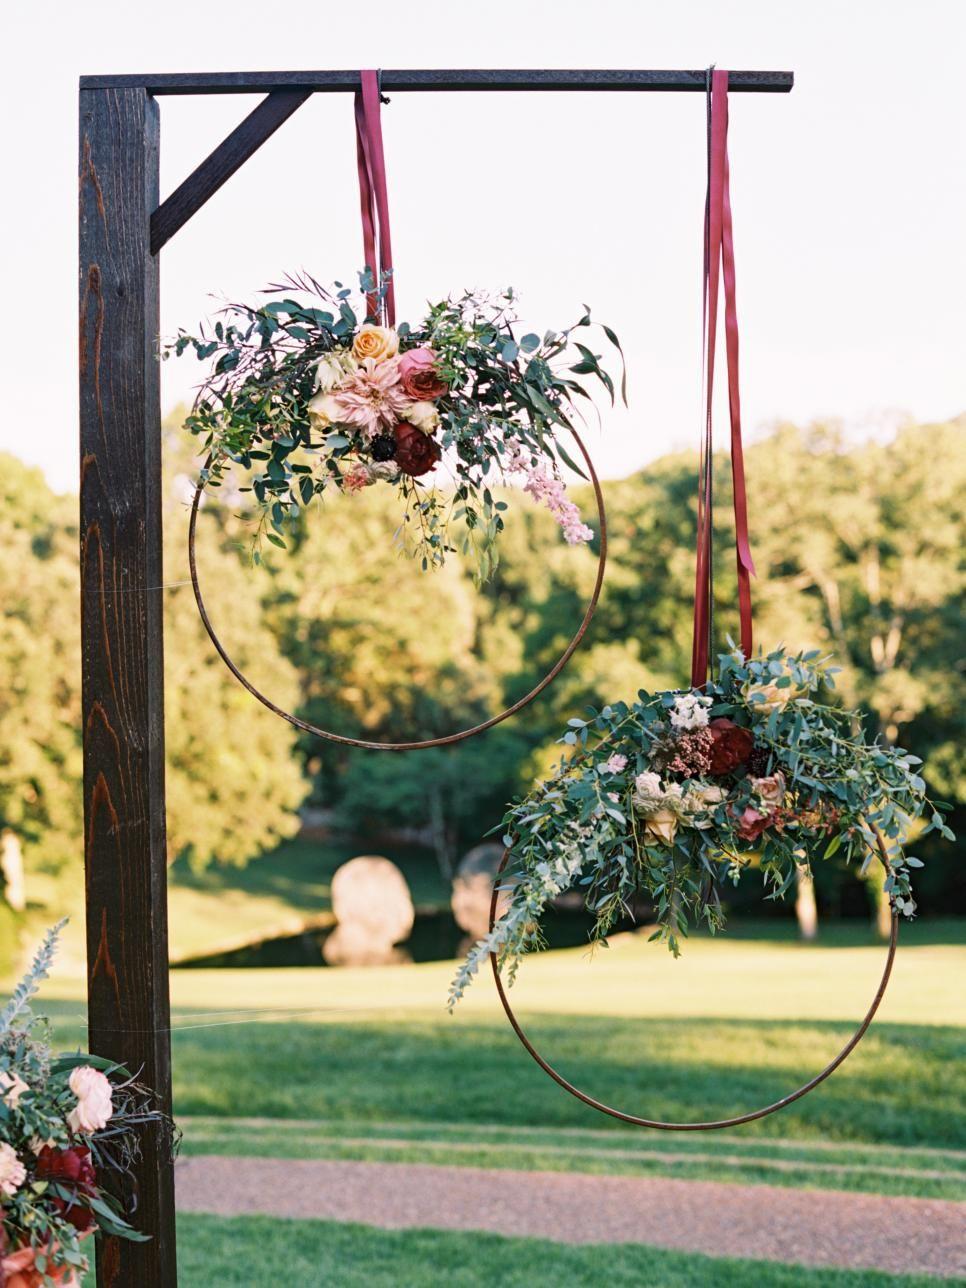 diy wedding arbors altars u aisles floral arch backdrops and arch